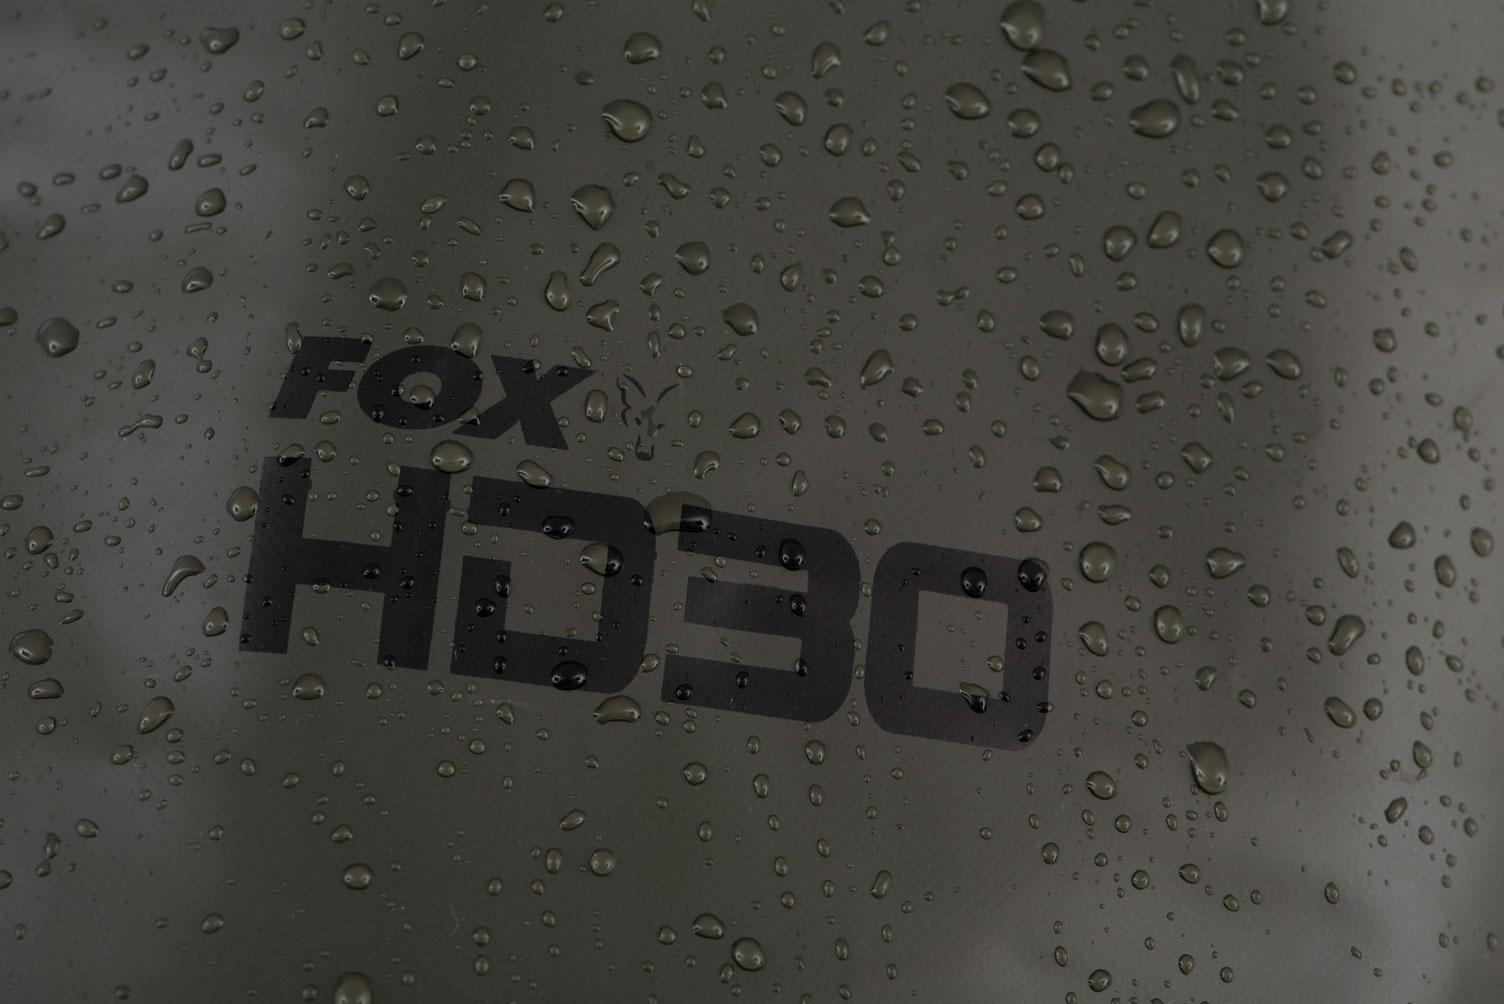 hd30_wet_logojpg